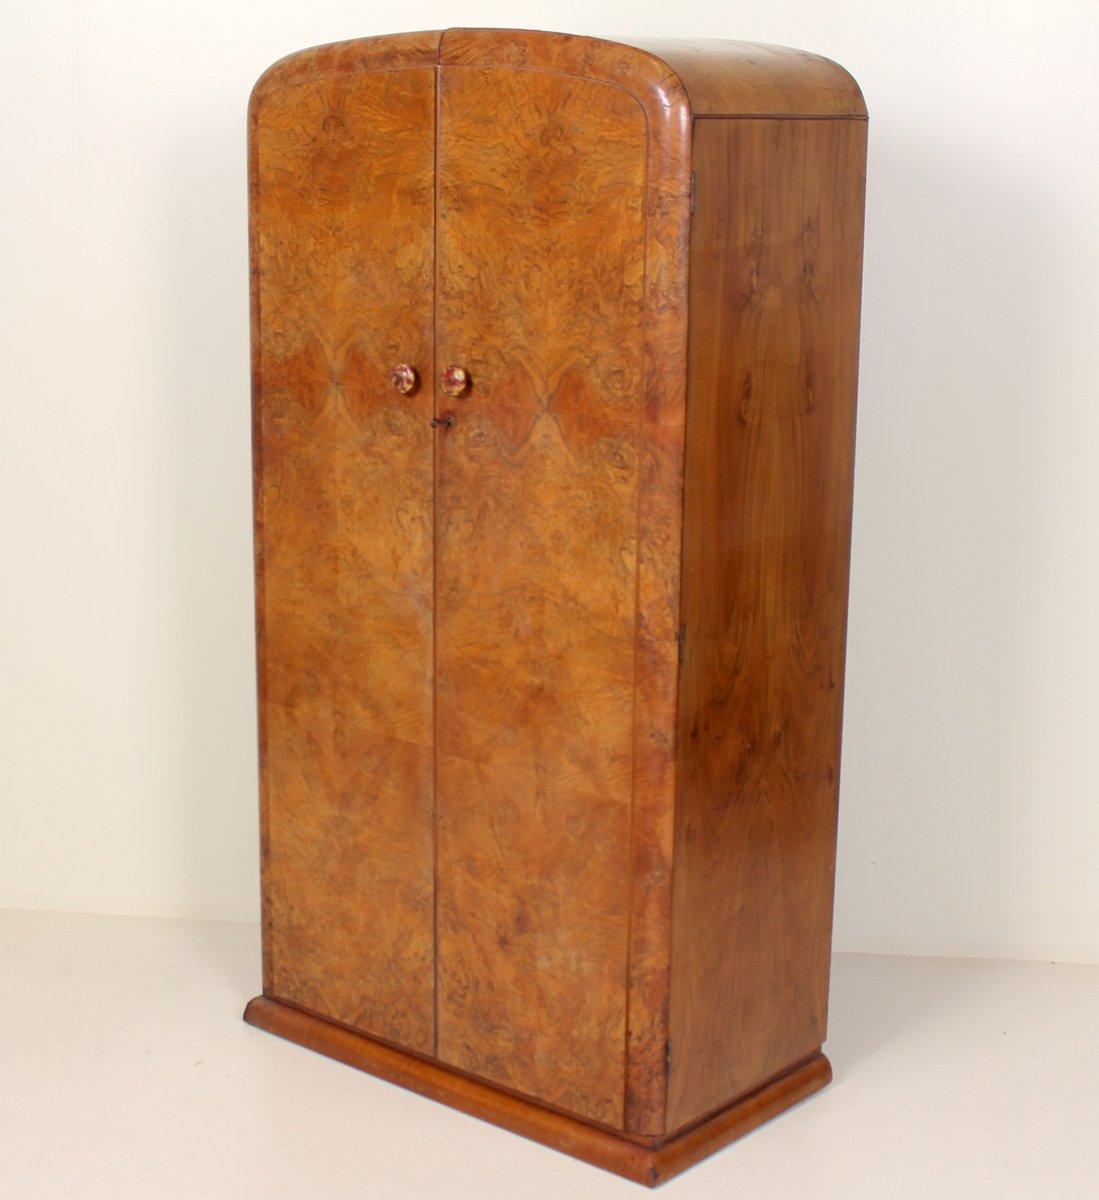 Art Deco Compactum Kleiderschrank aus Nussholz, 1930er